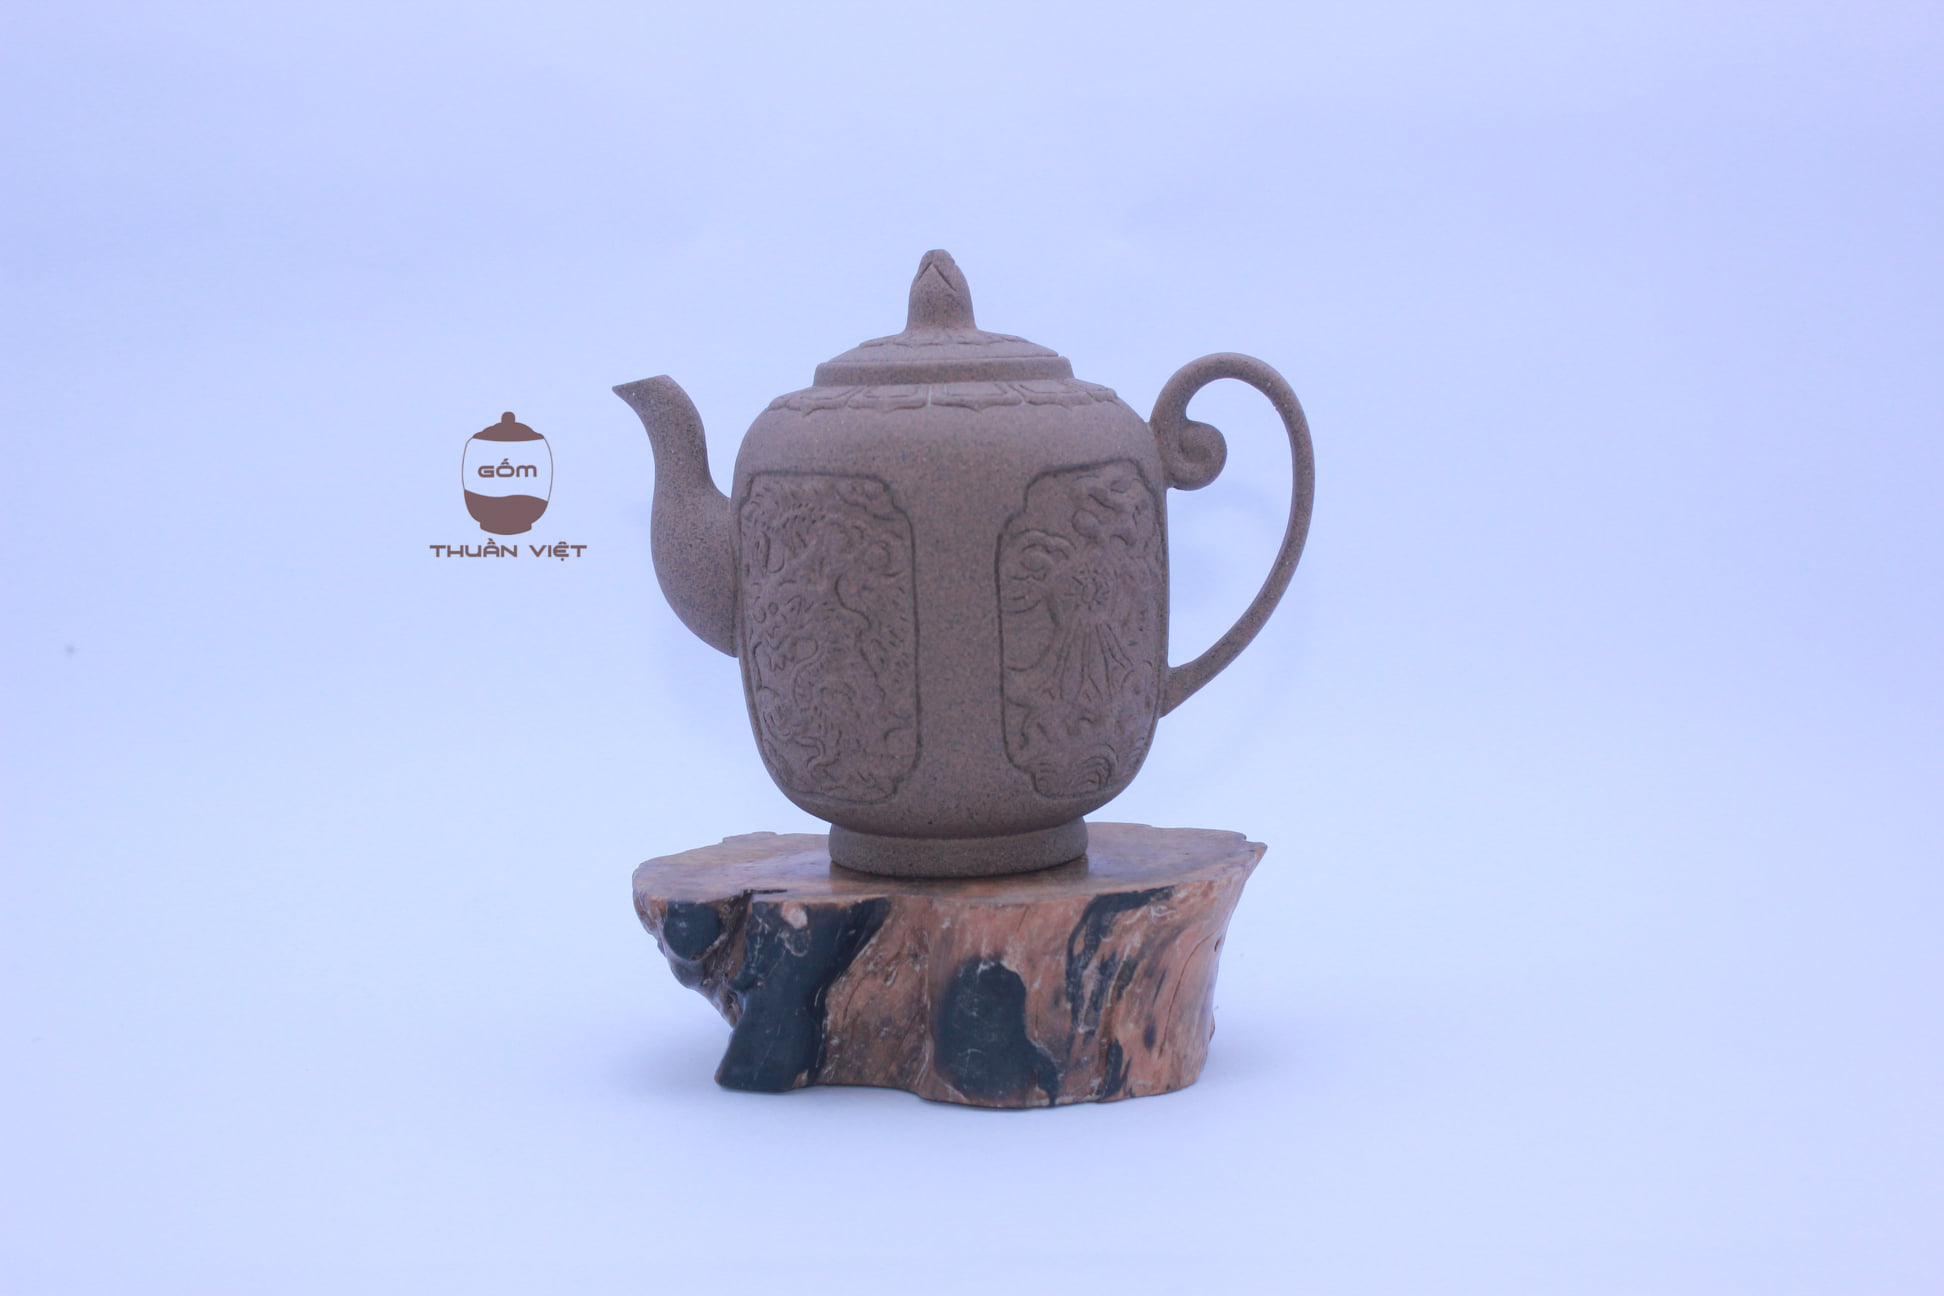 Bình trà tri kỹ